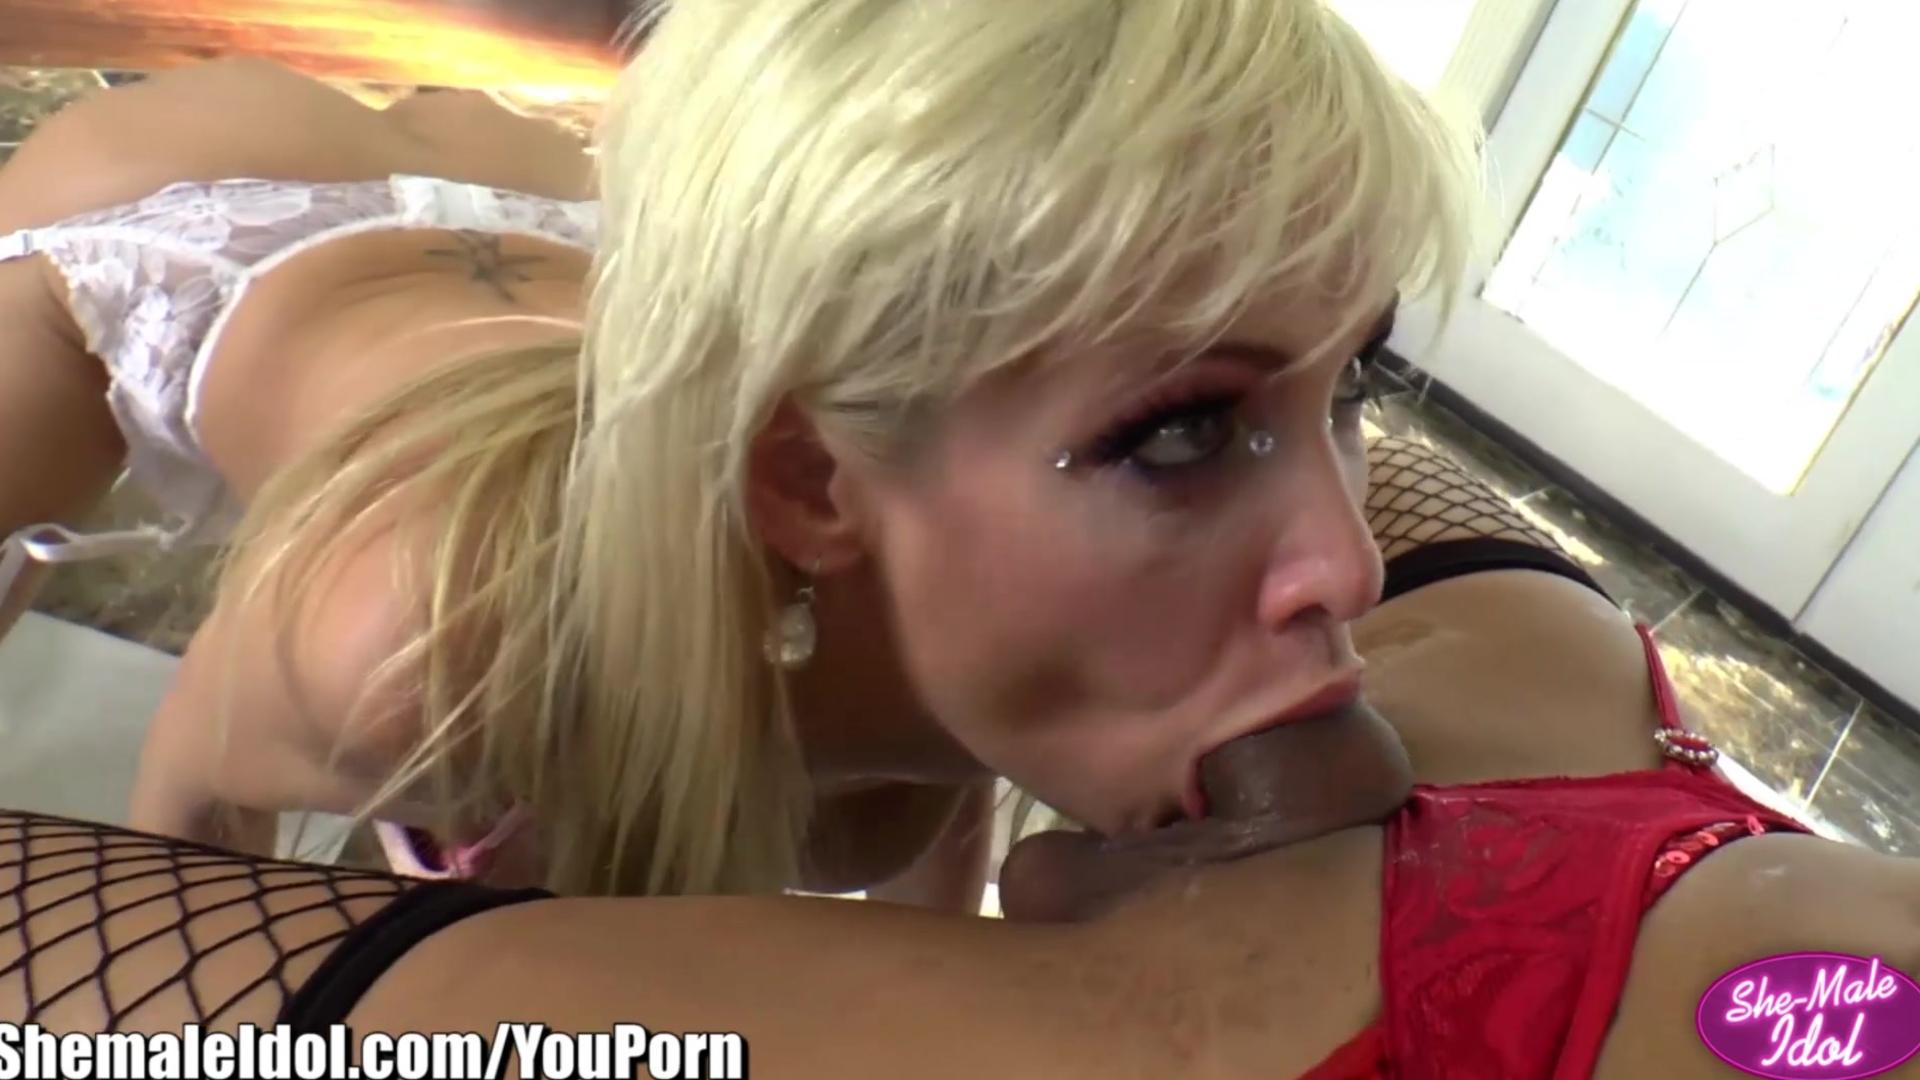 ShemaleIdol Latina Jessy Dubai Anally Fucks Girl